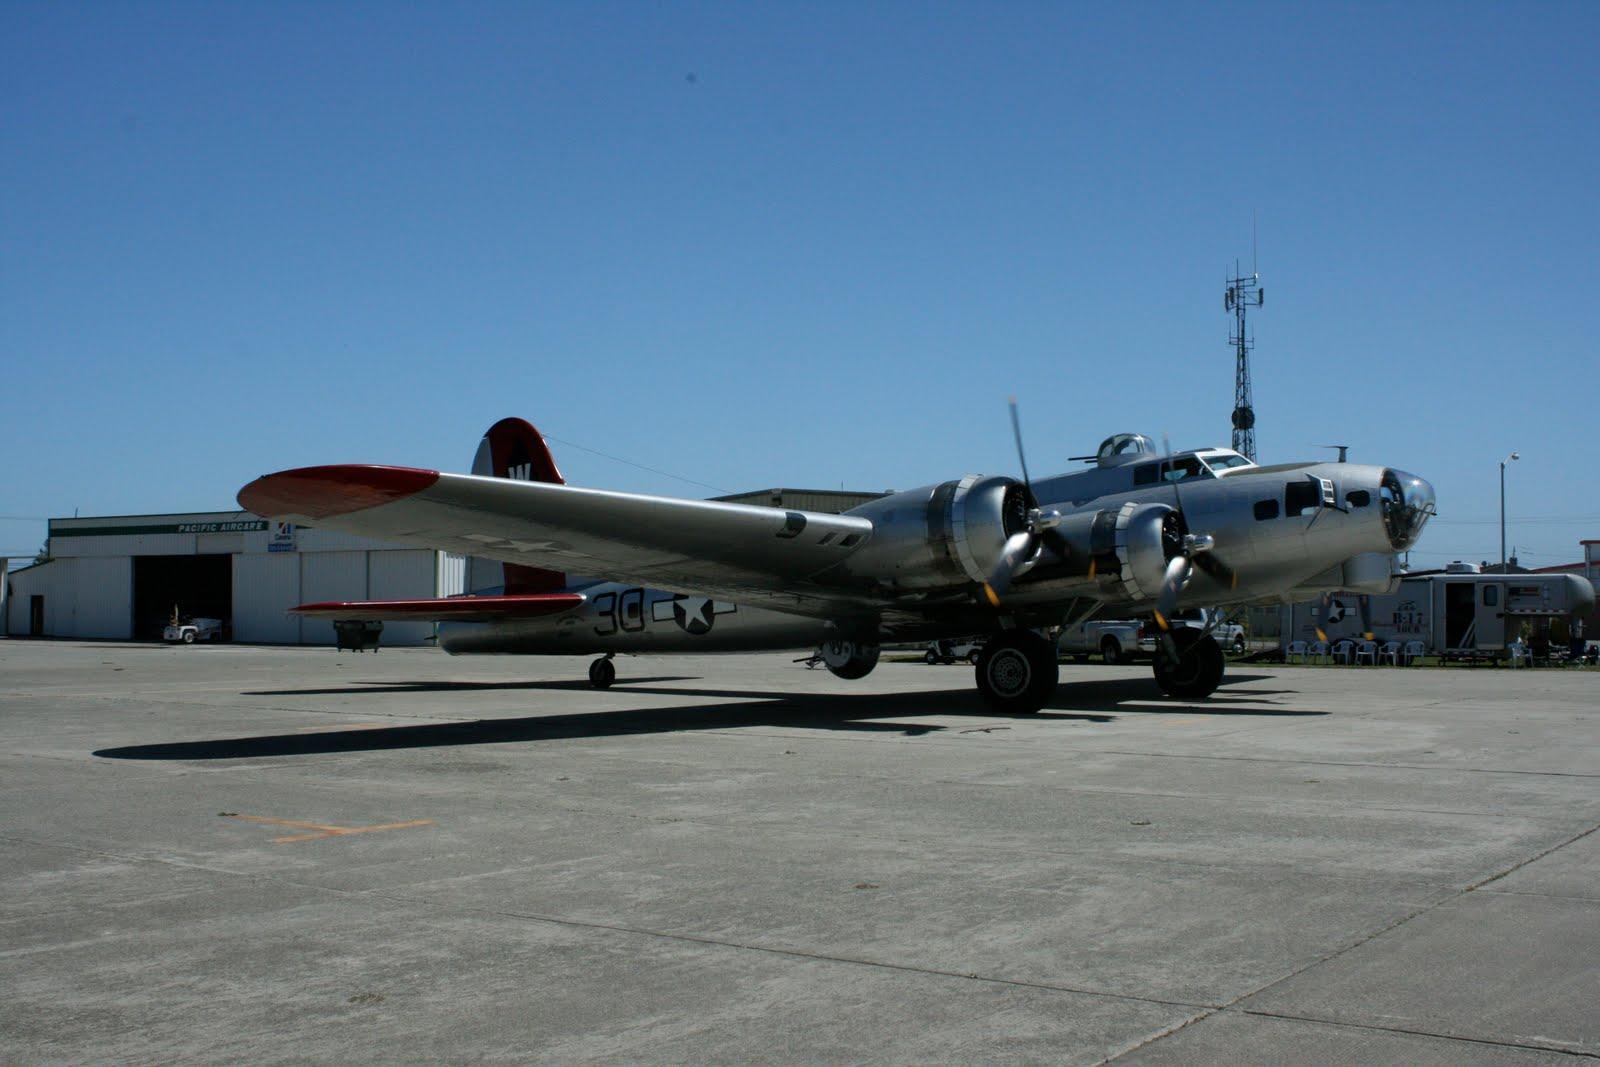 In front of the hangar